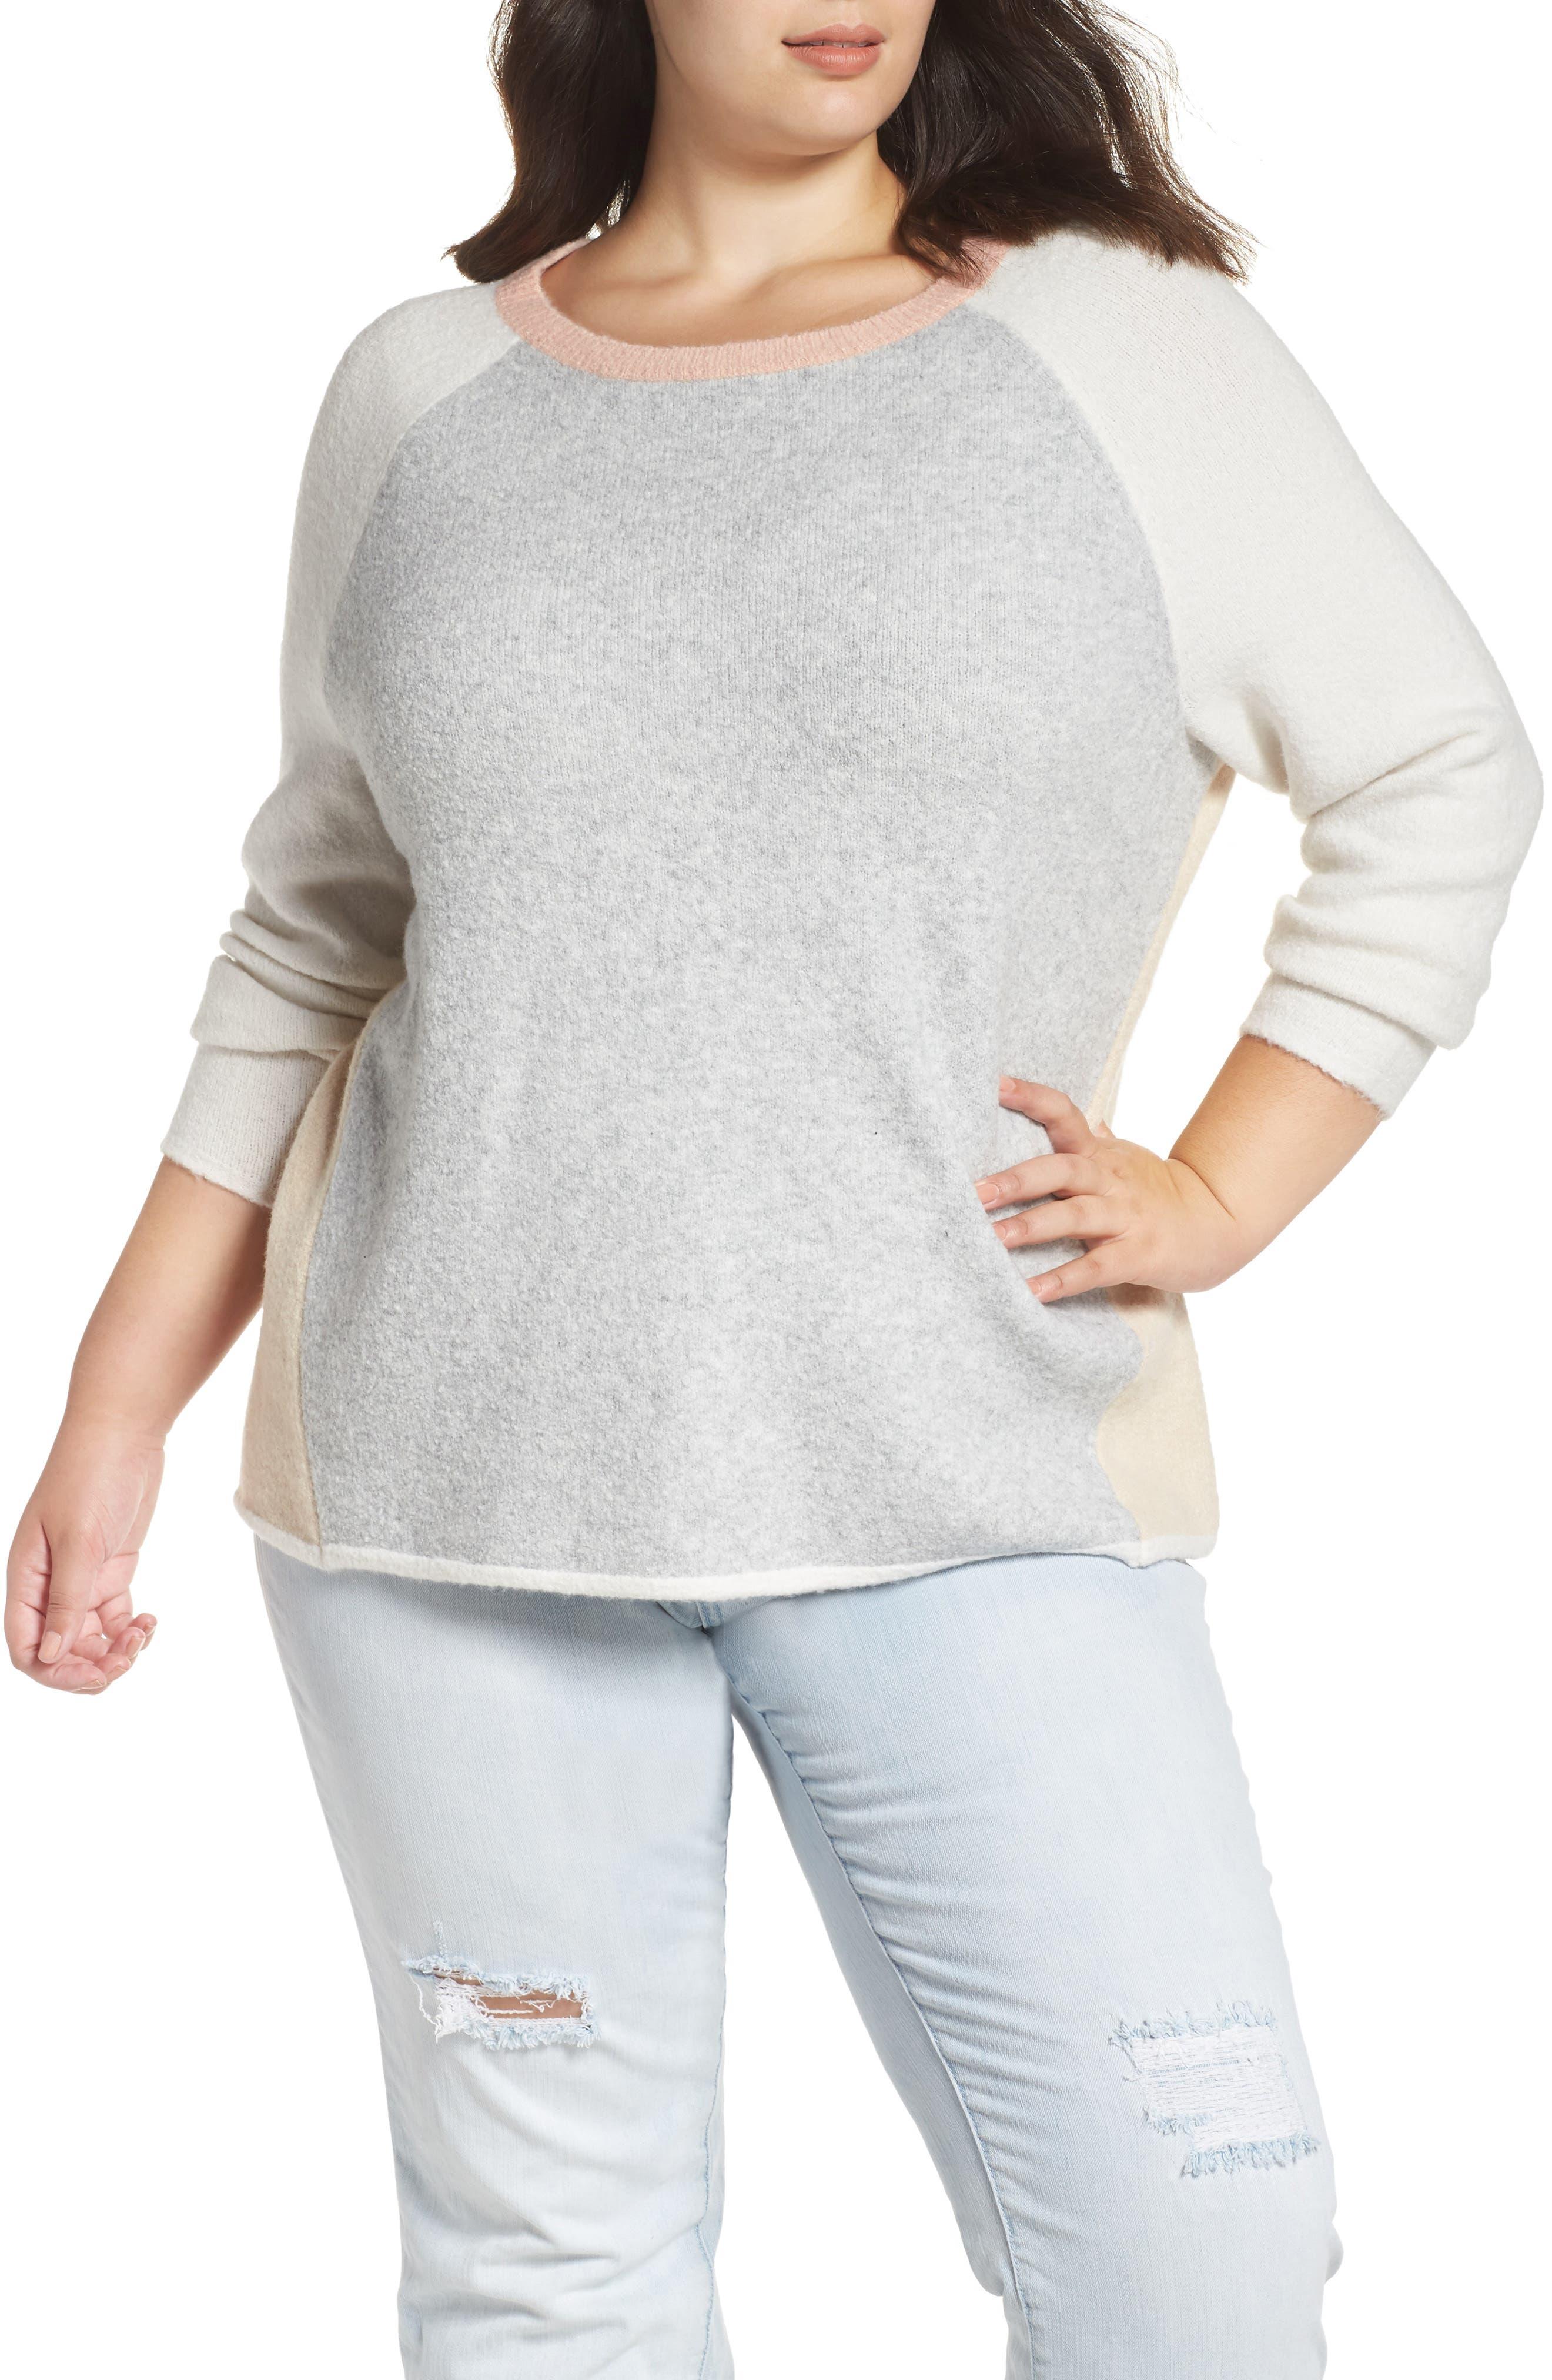 Colorblock Sweater,                             Main thumbnail 1, color,                             GREY LT HEATHER CB